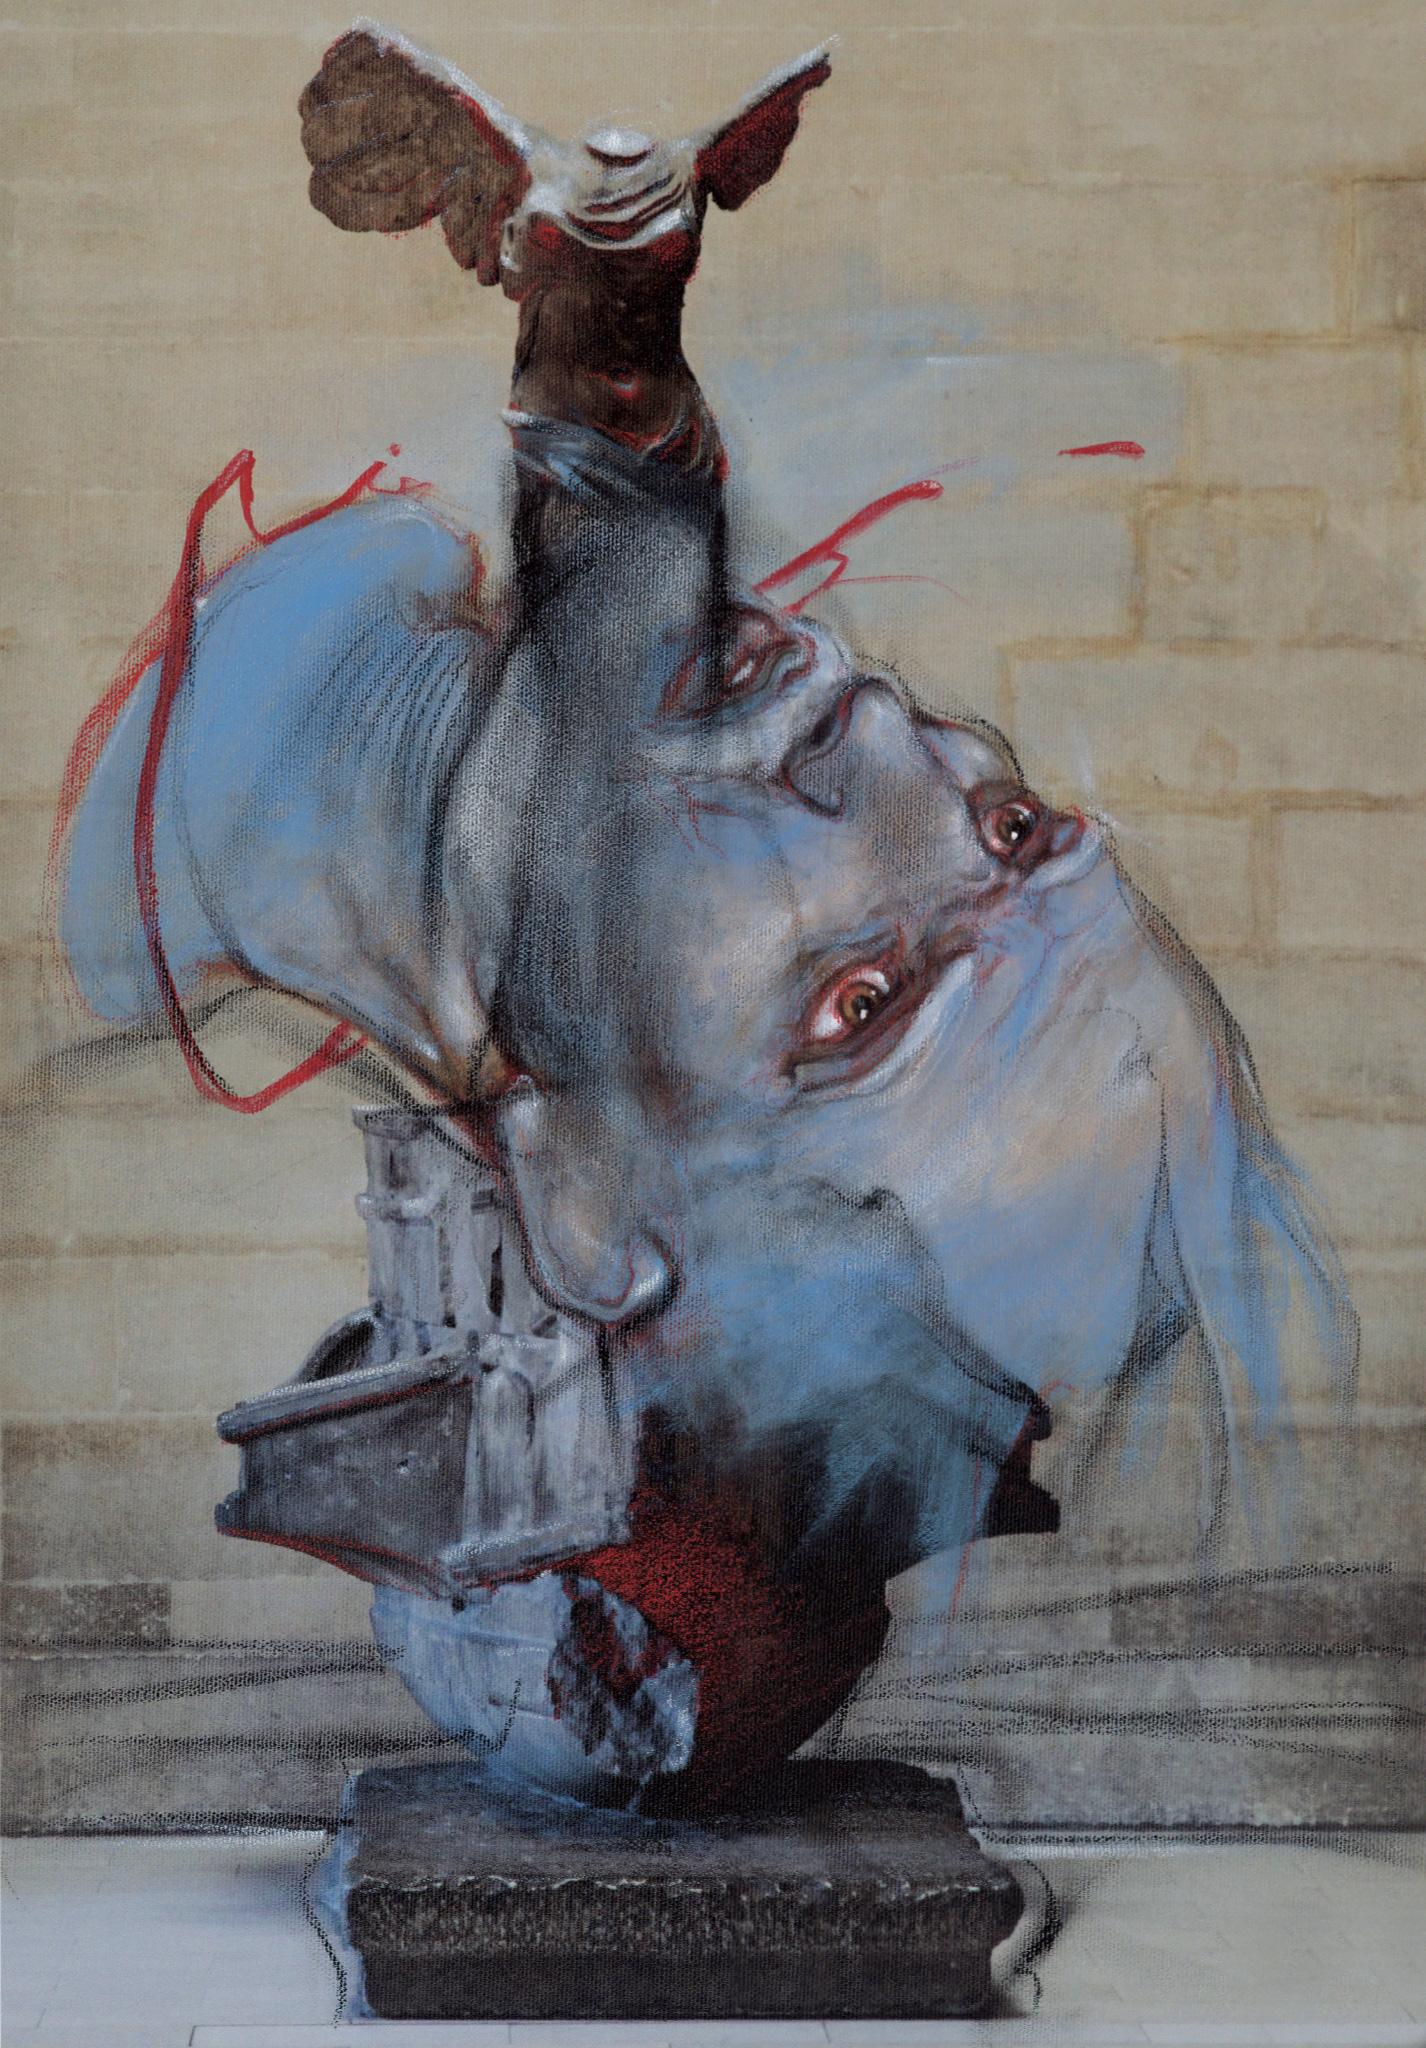 Bilal-fantomes-louvre-01